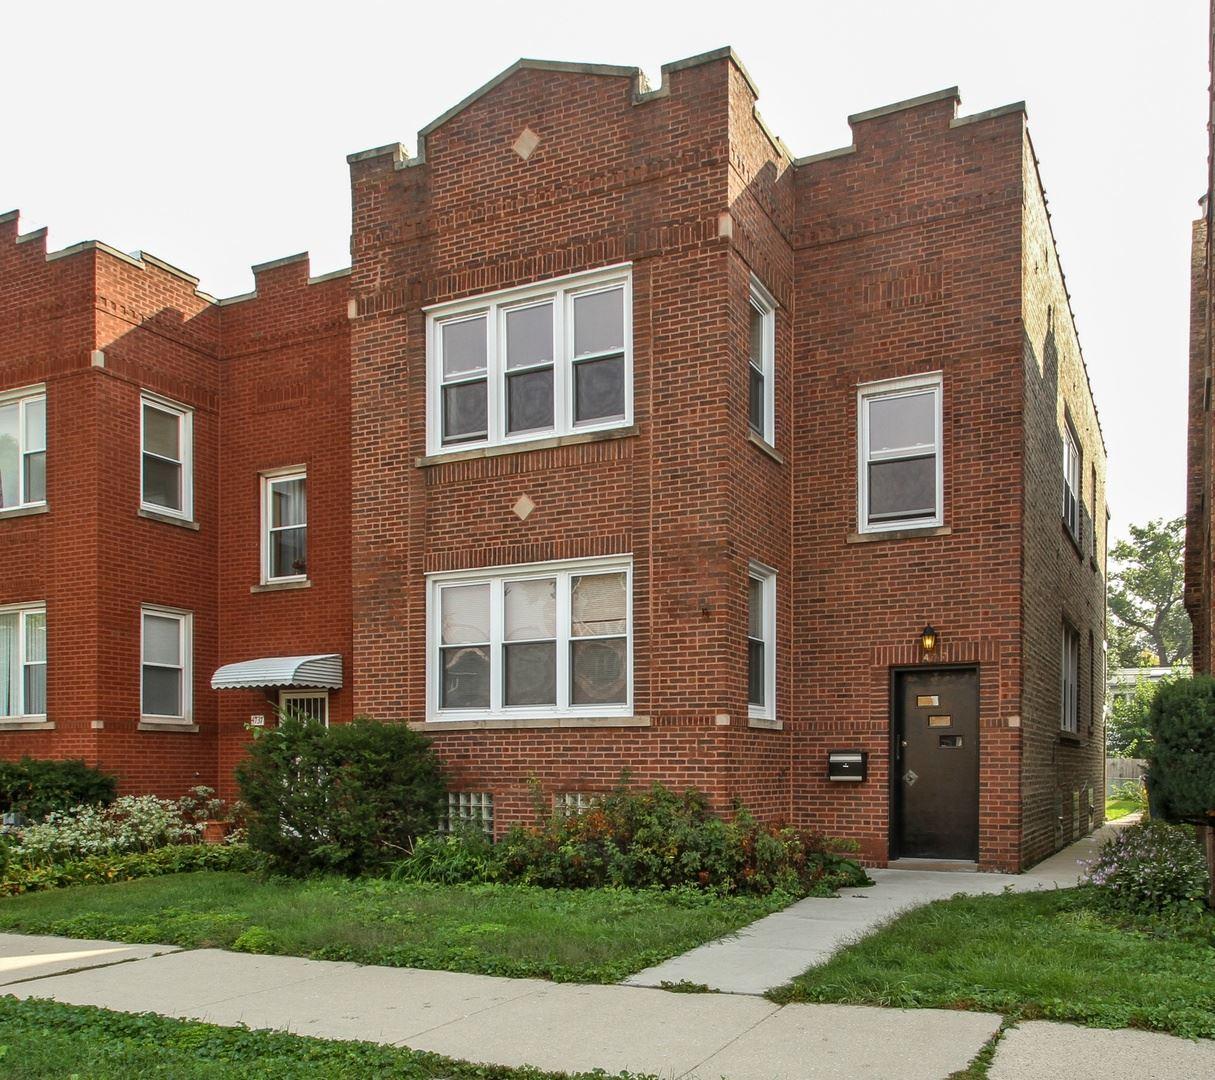 4733 N Kilpatrick Avenue, Chicago, IL 60630 - #: 10670056